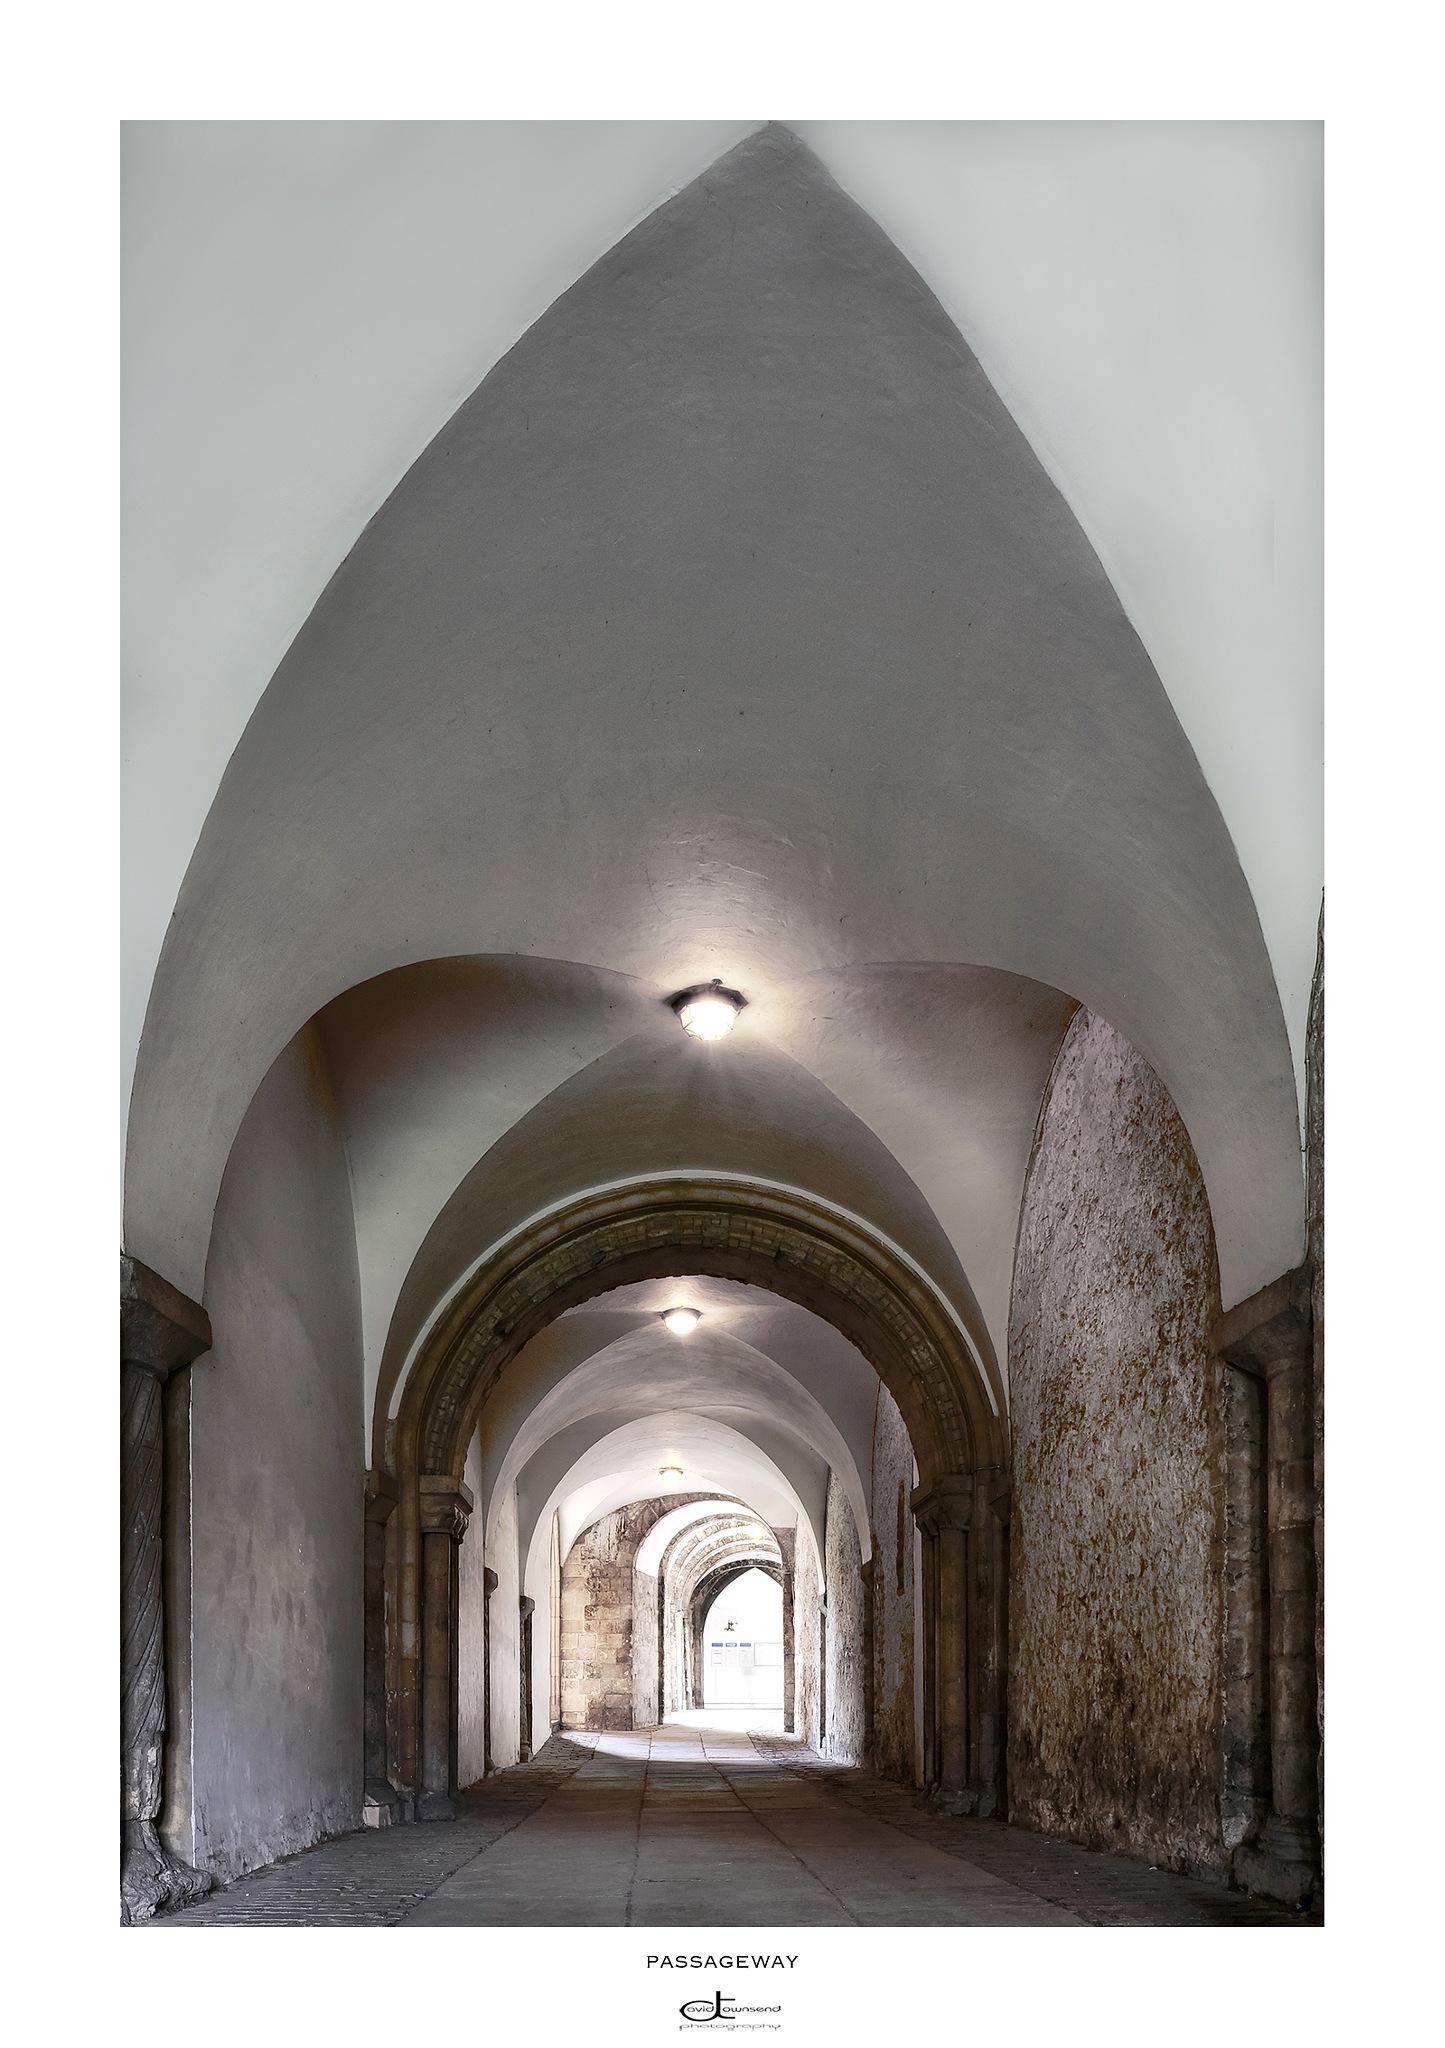 Passageway  by David Townsend